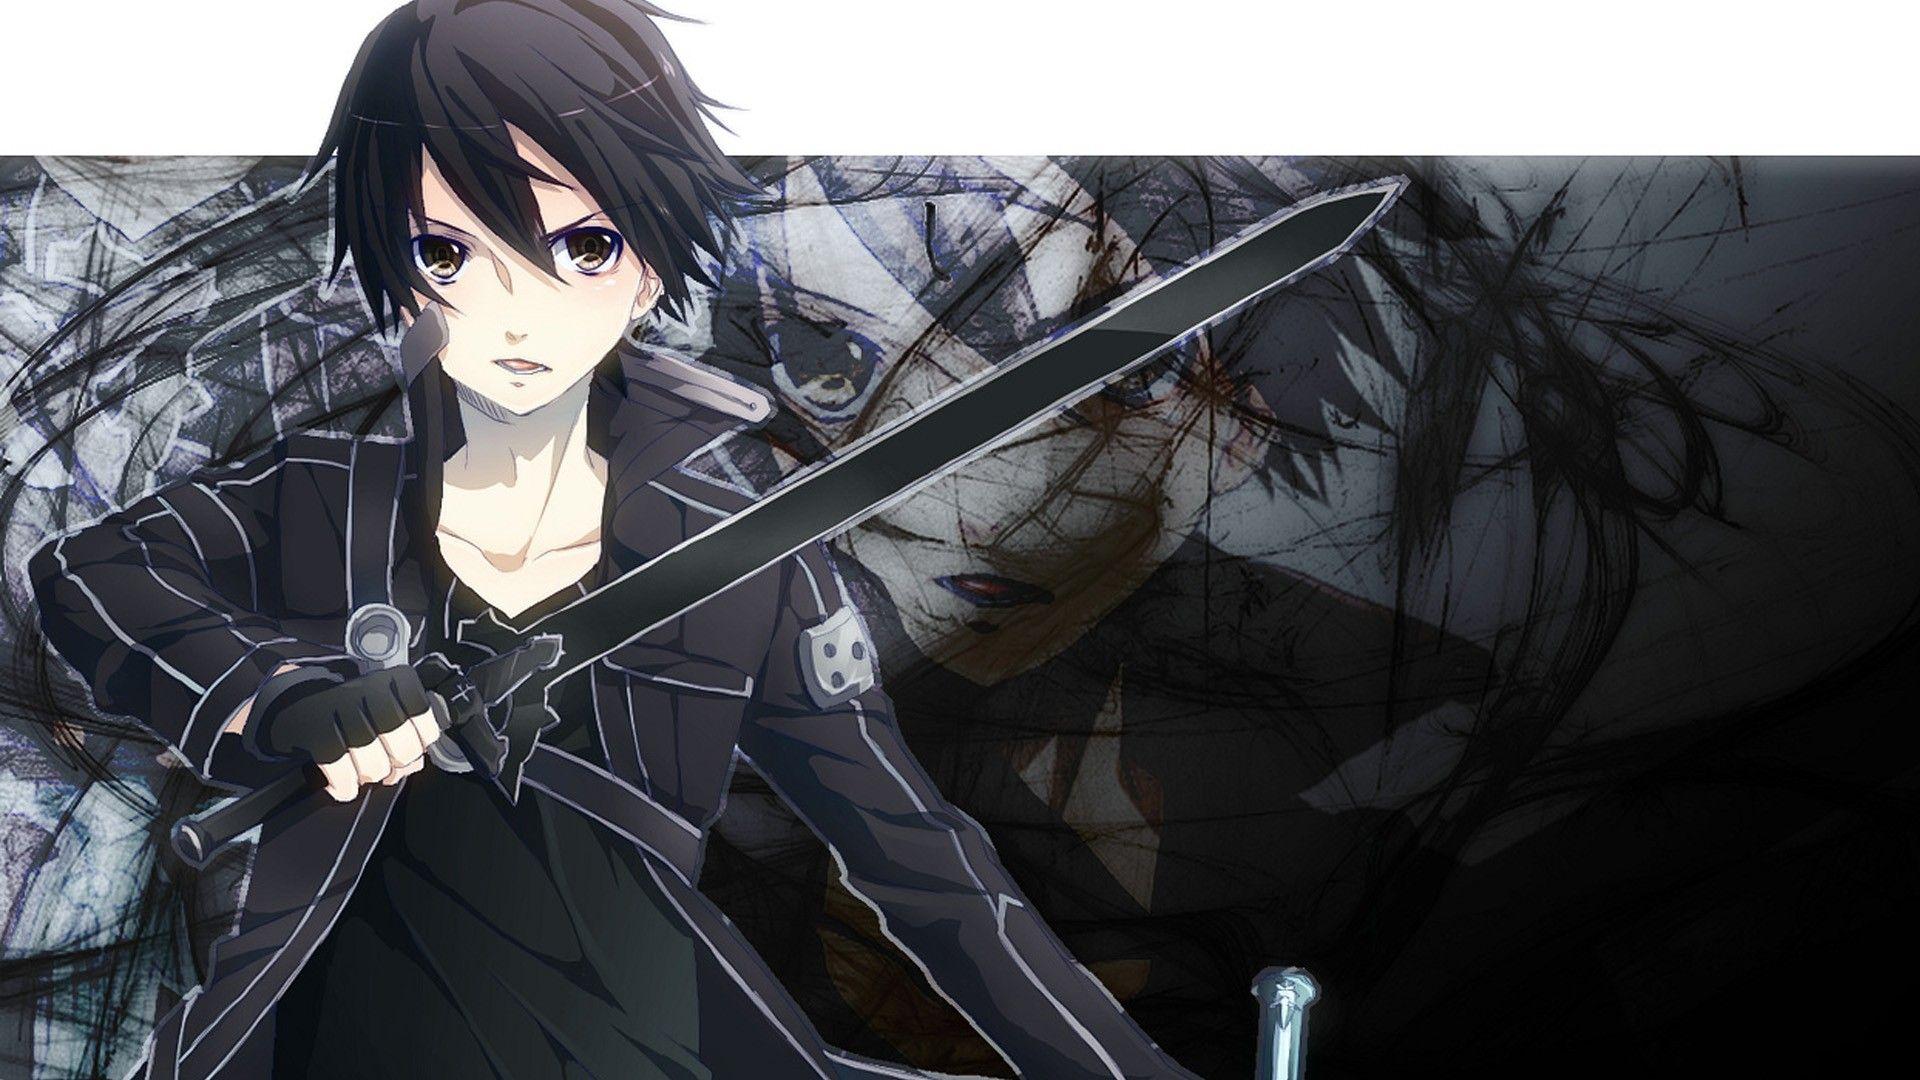 sword art online Anime Sword Art Online Pics, free